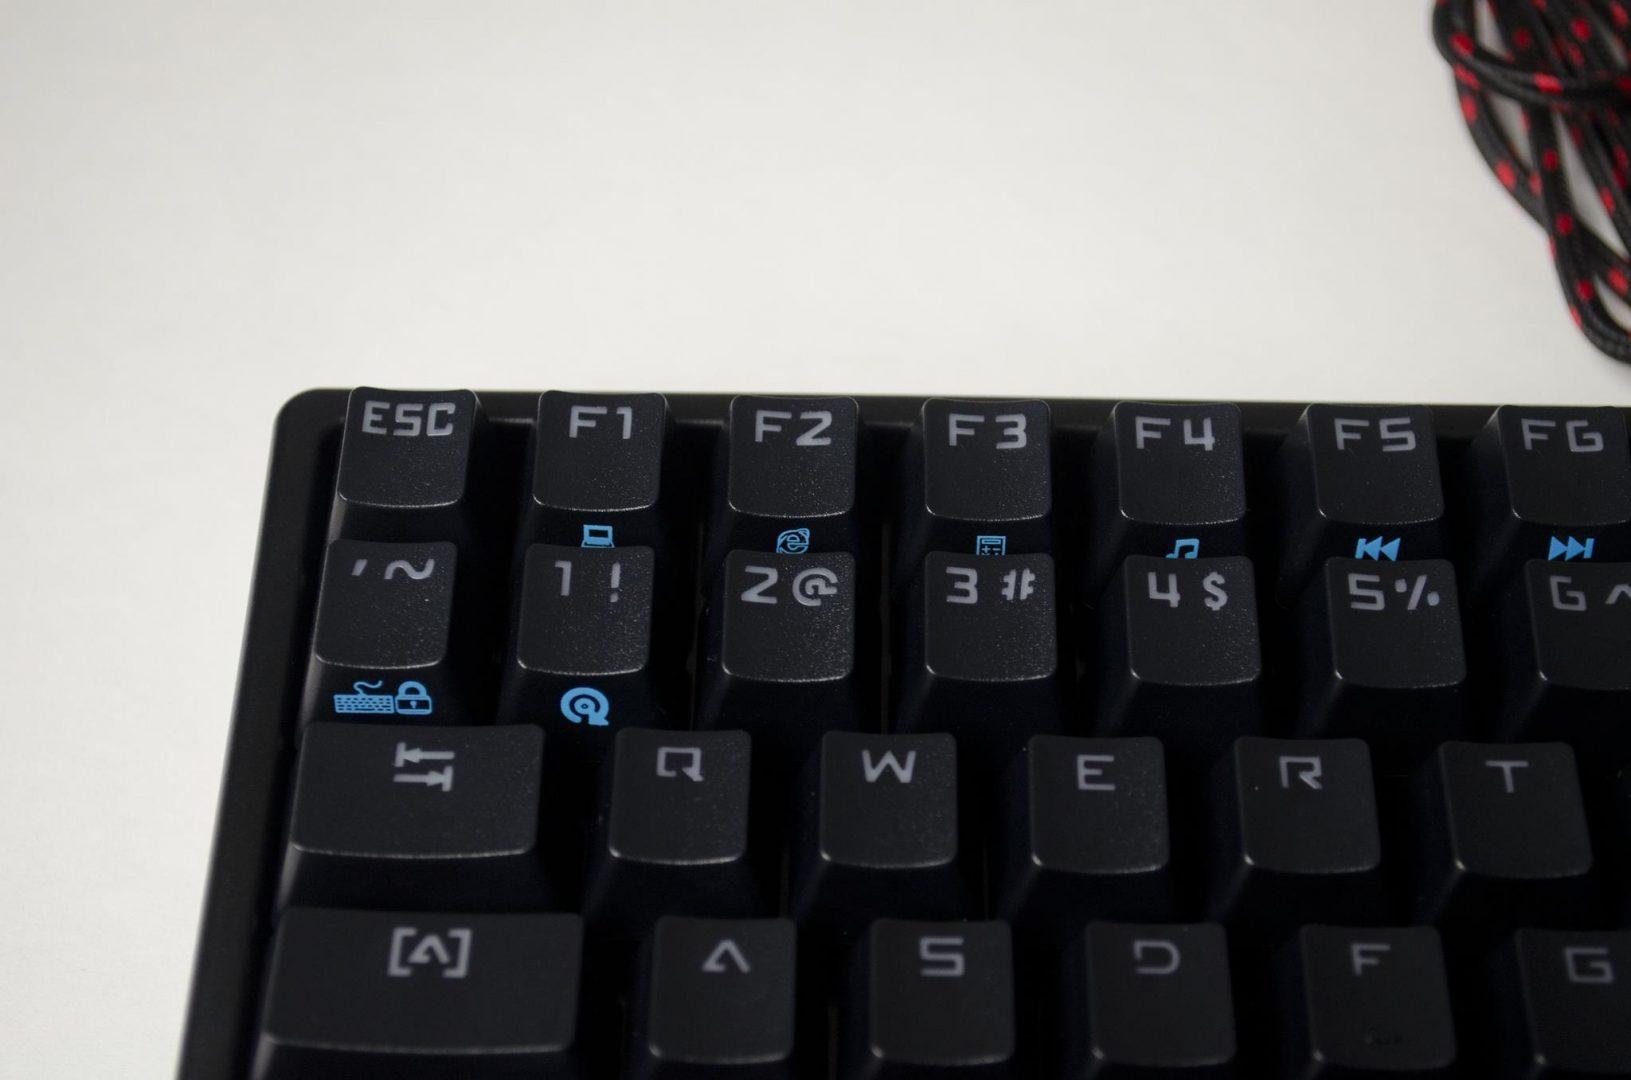 drevo gramr keyboard review_4